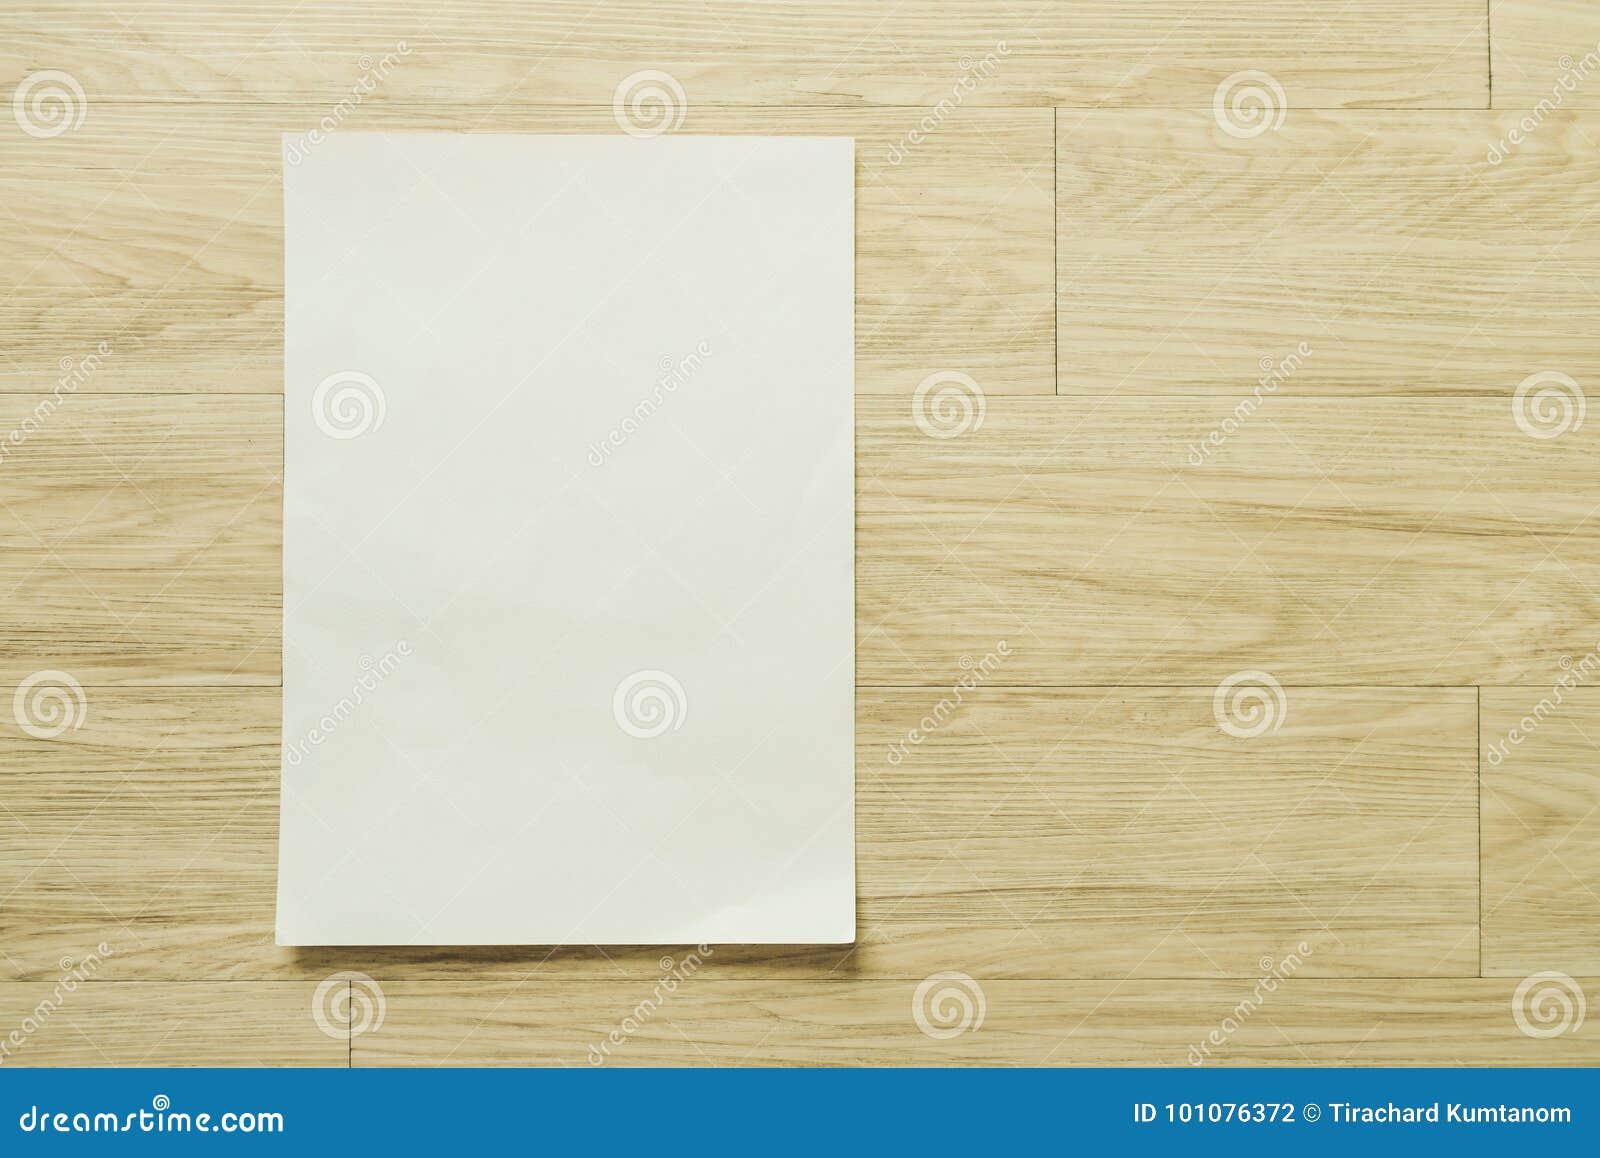 mock up flyer pamphlet brochure design a4 size paper layout space